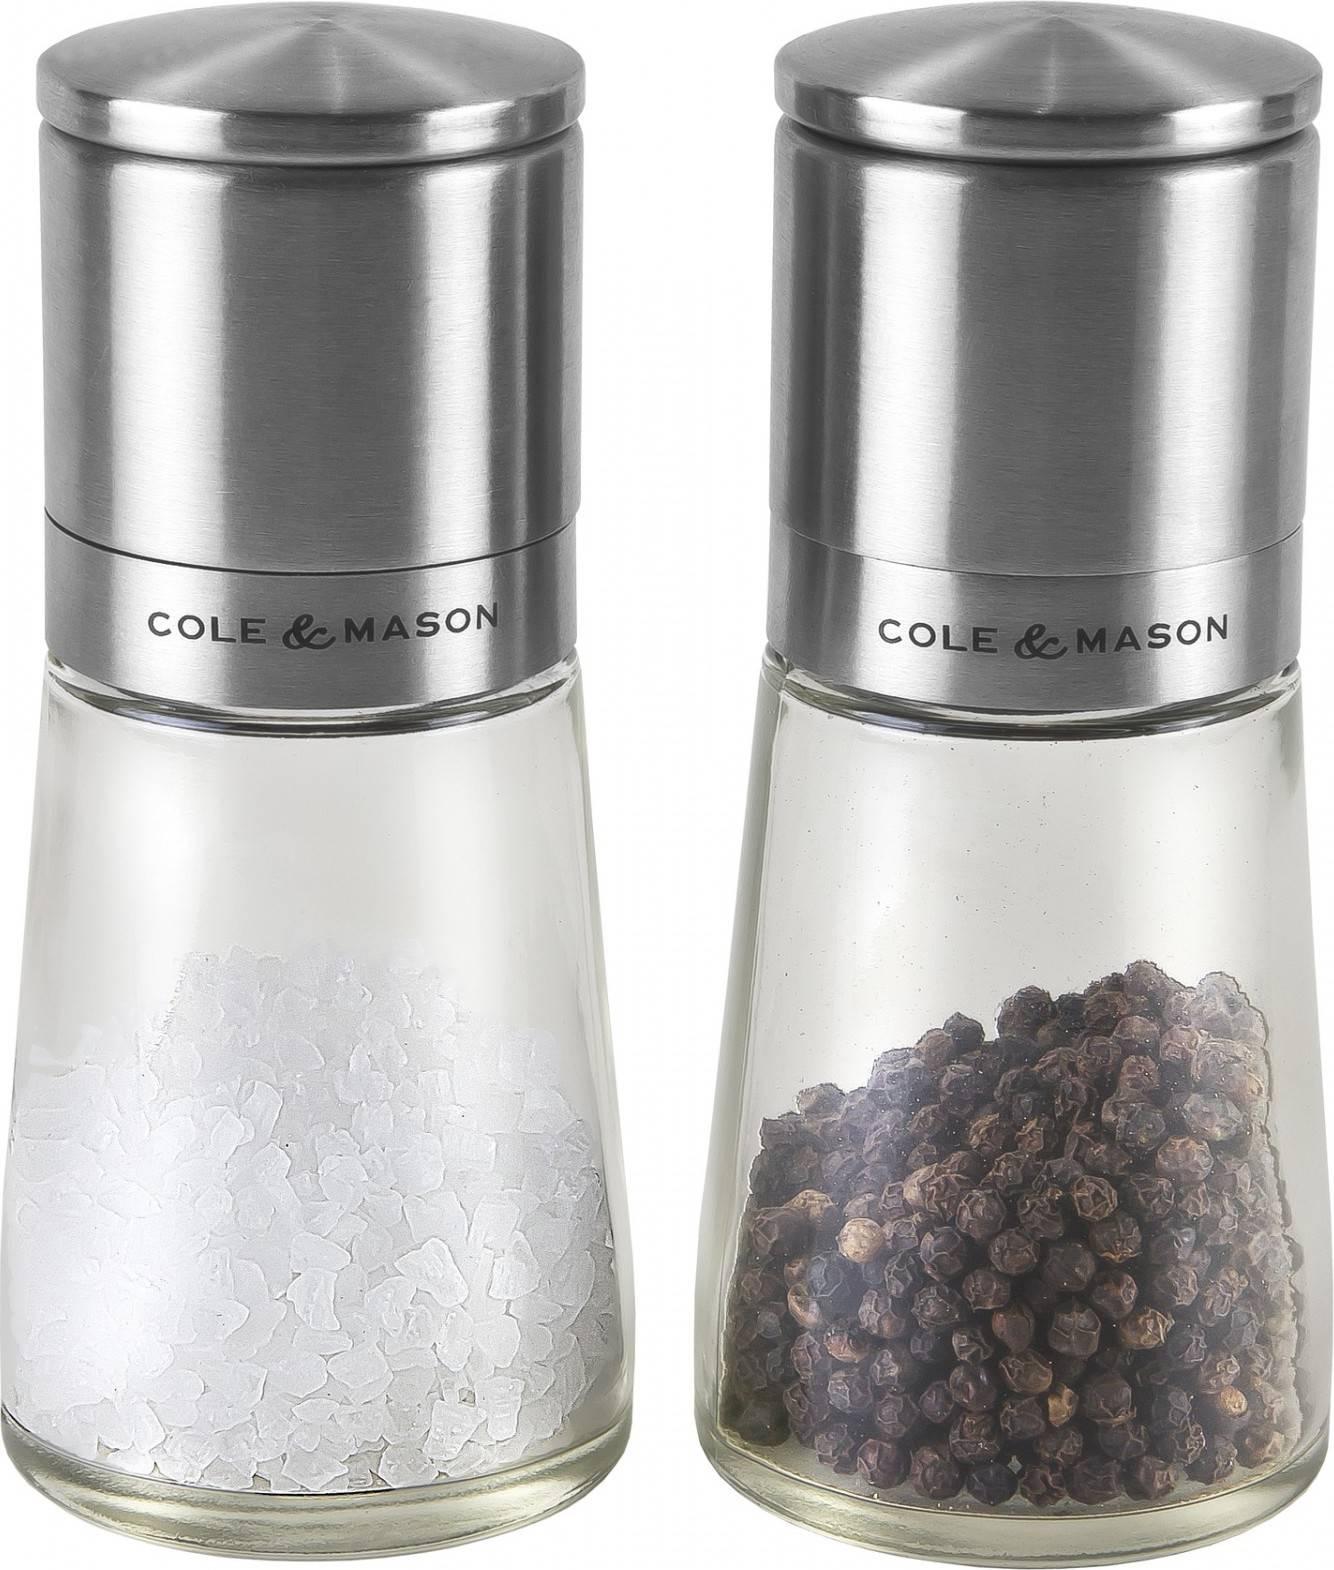 Cole & Mason CLIFTON sada mlýnků na sůl a pepř H306898P DKB Household UK Limited